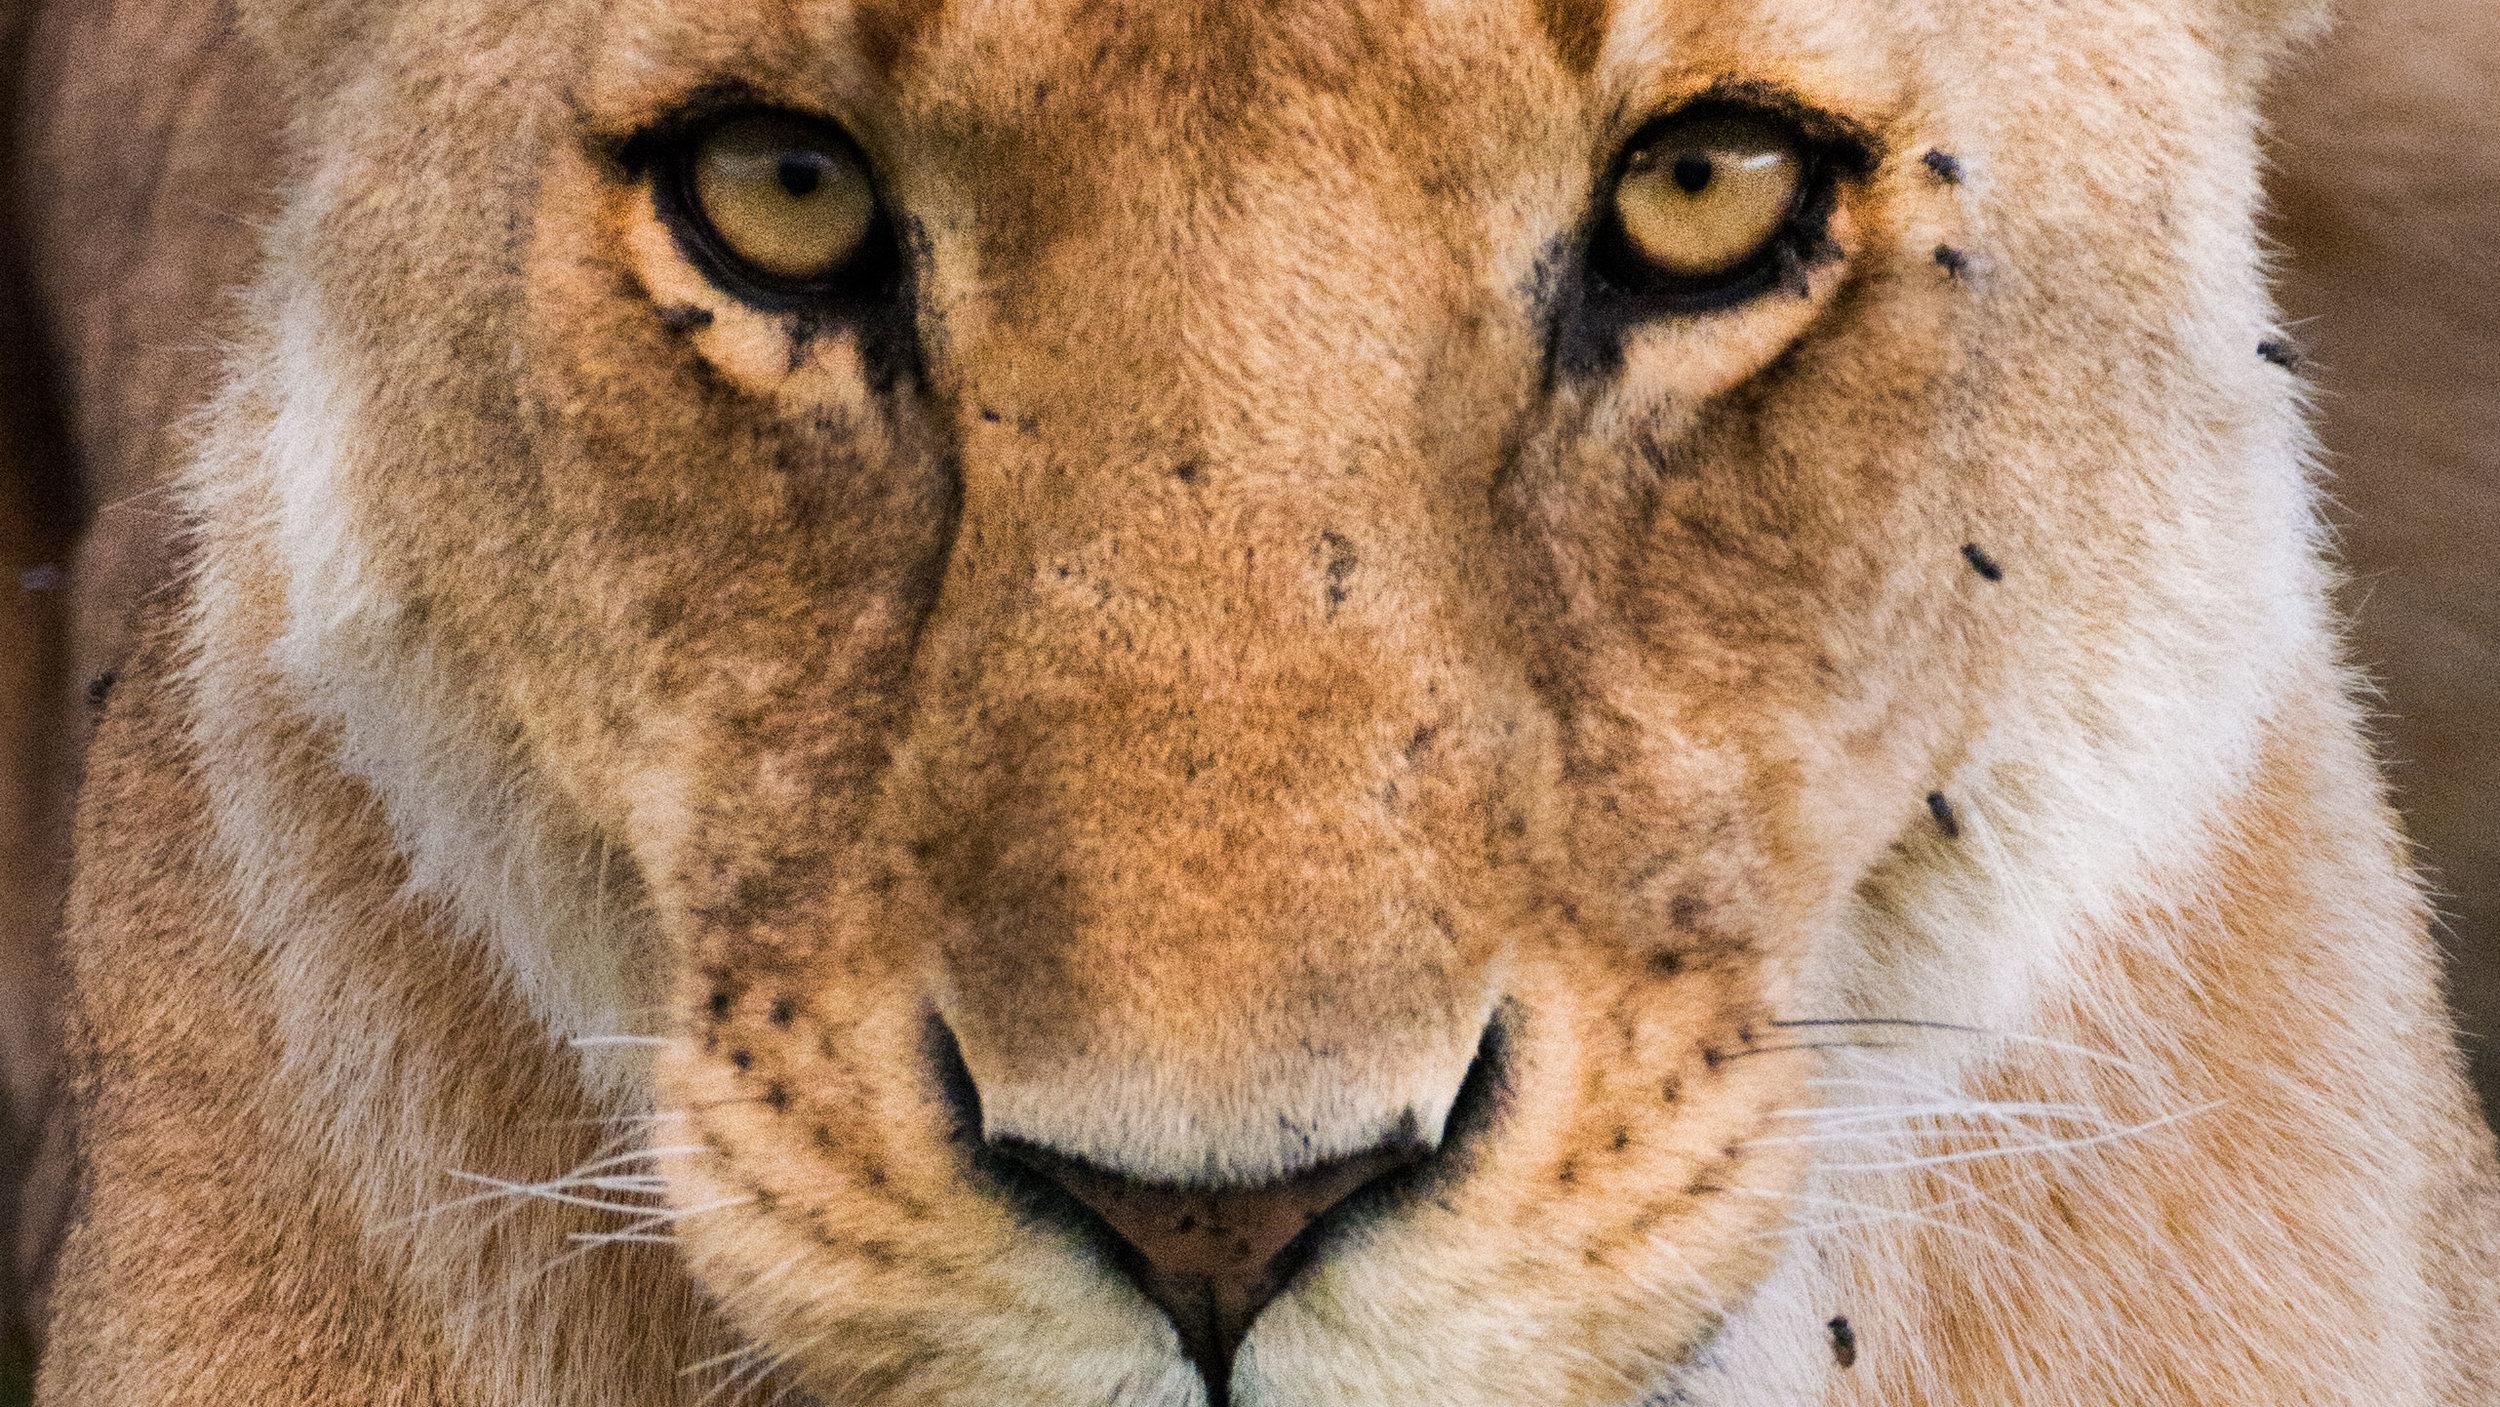 Lasting Footprints - wildlife conservation initiative